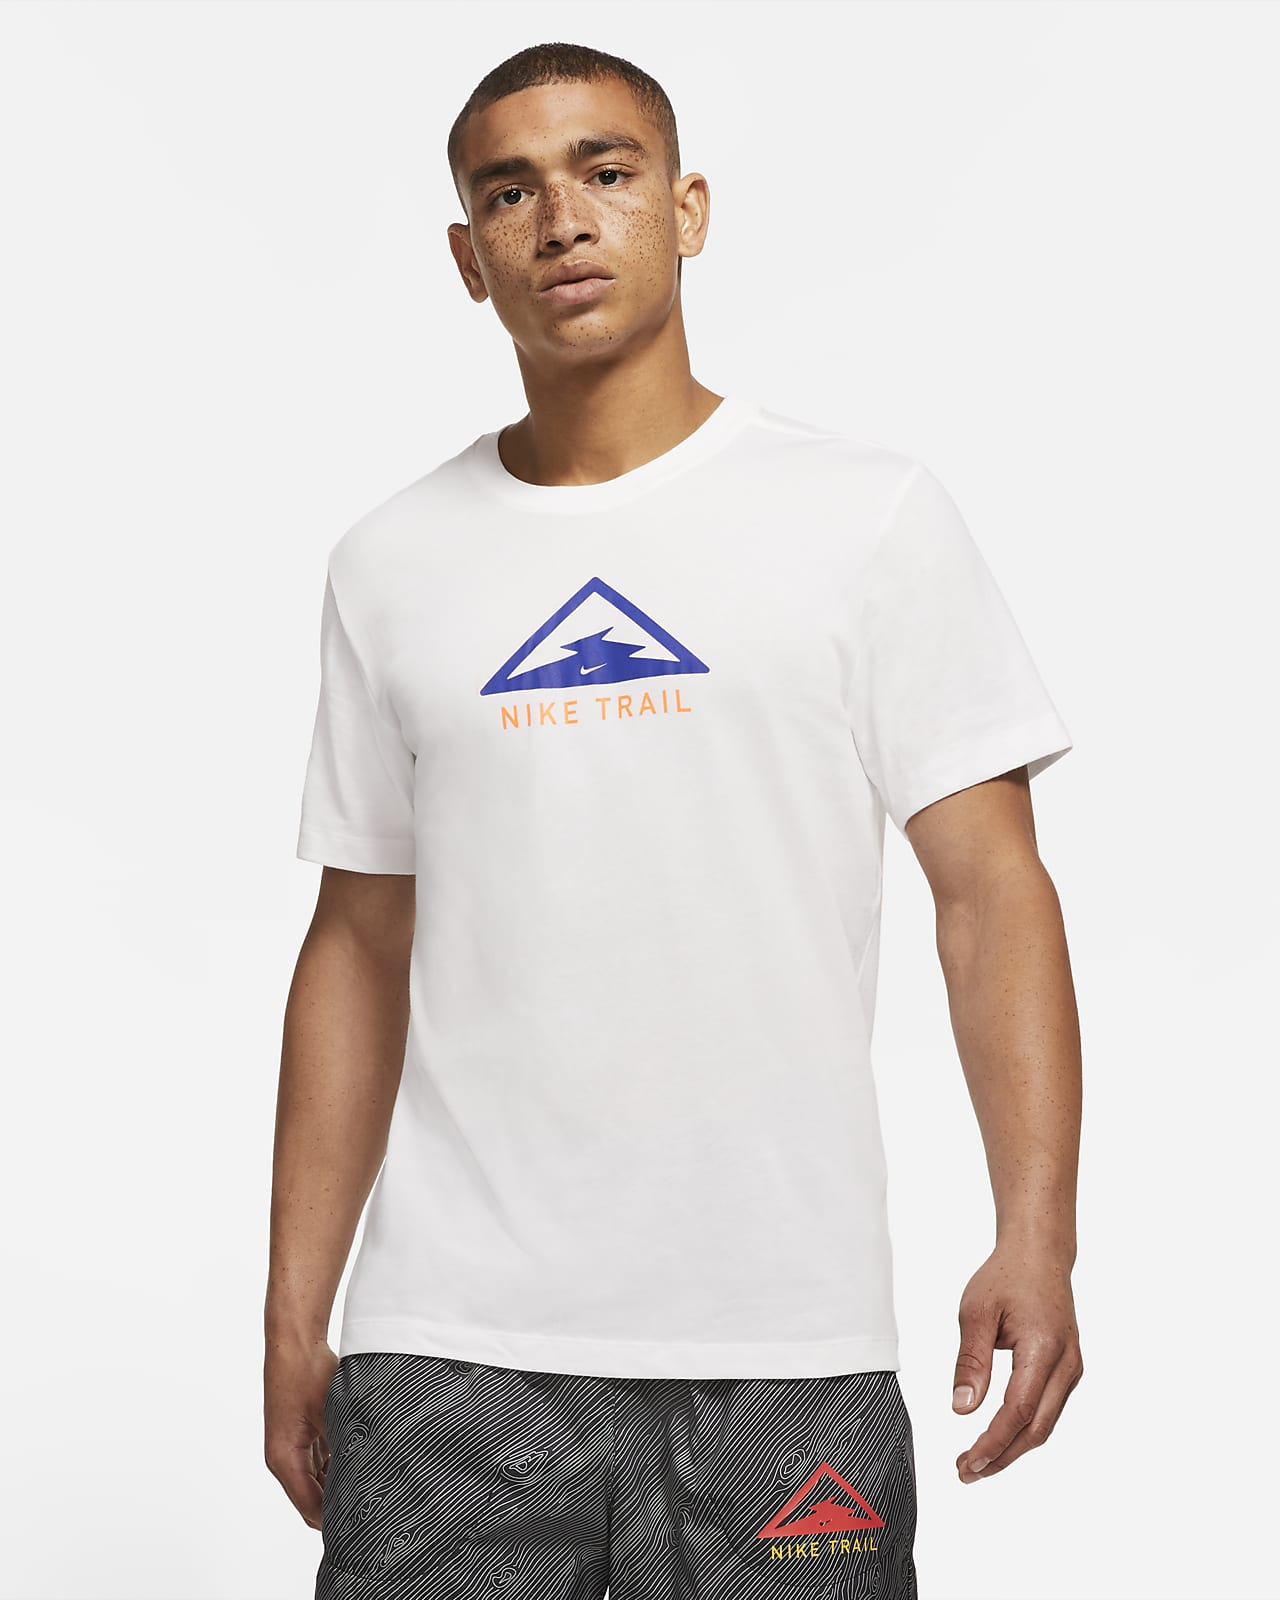 Мужская футболка для трейлраннинга Nike Dri-FIT Trail